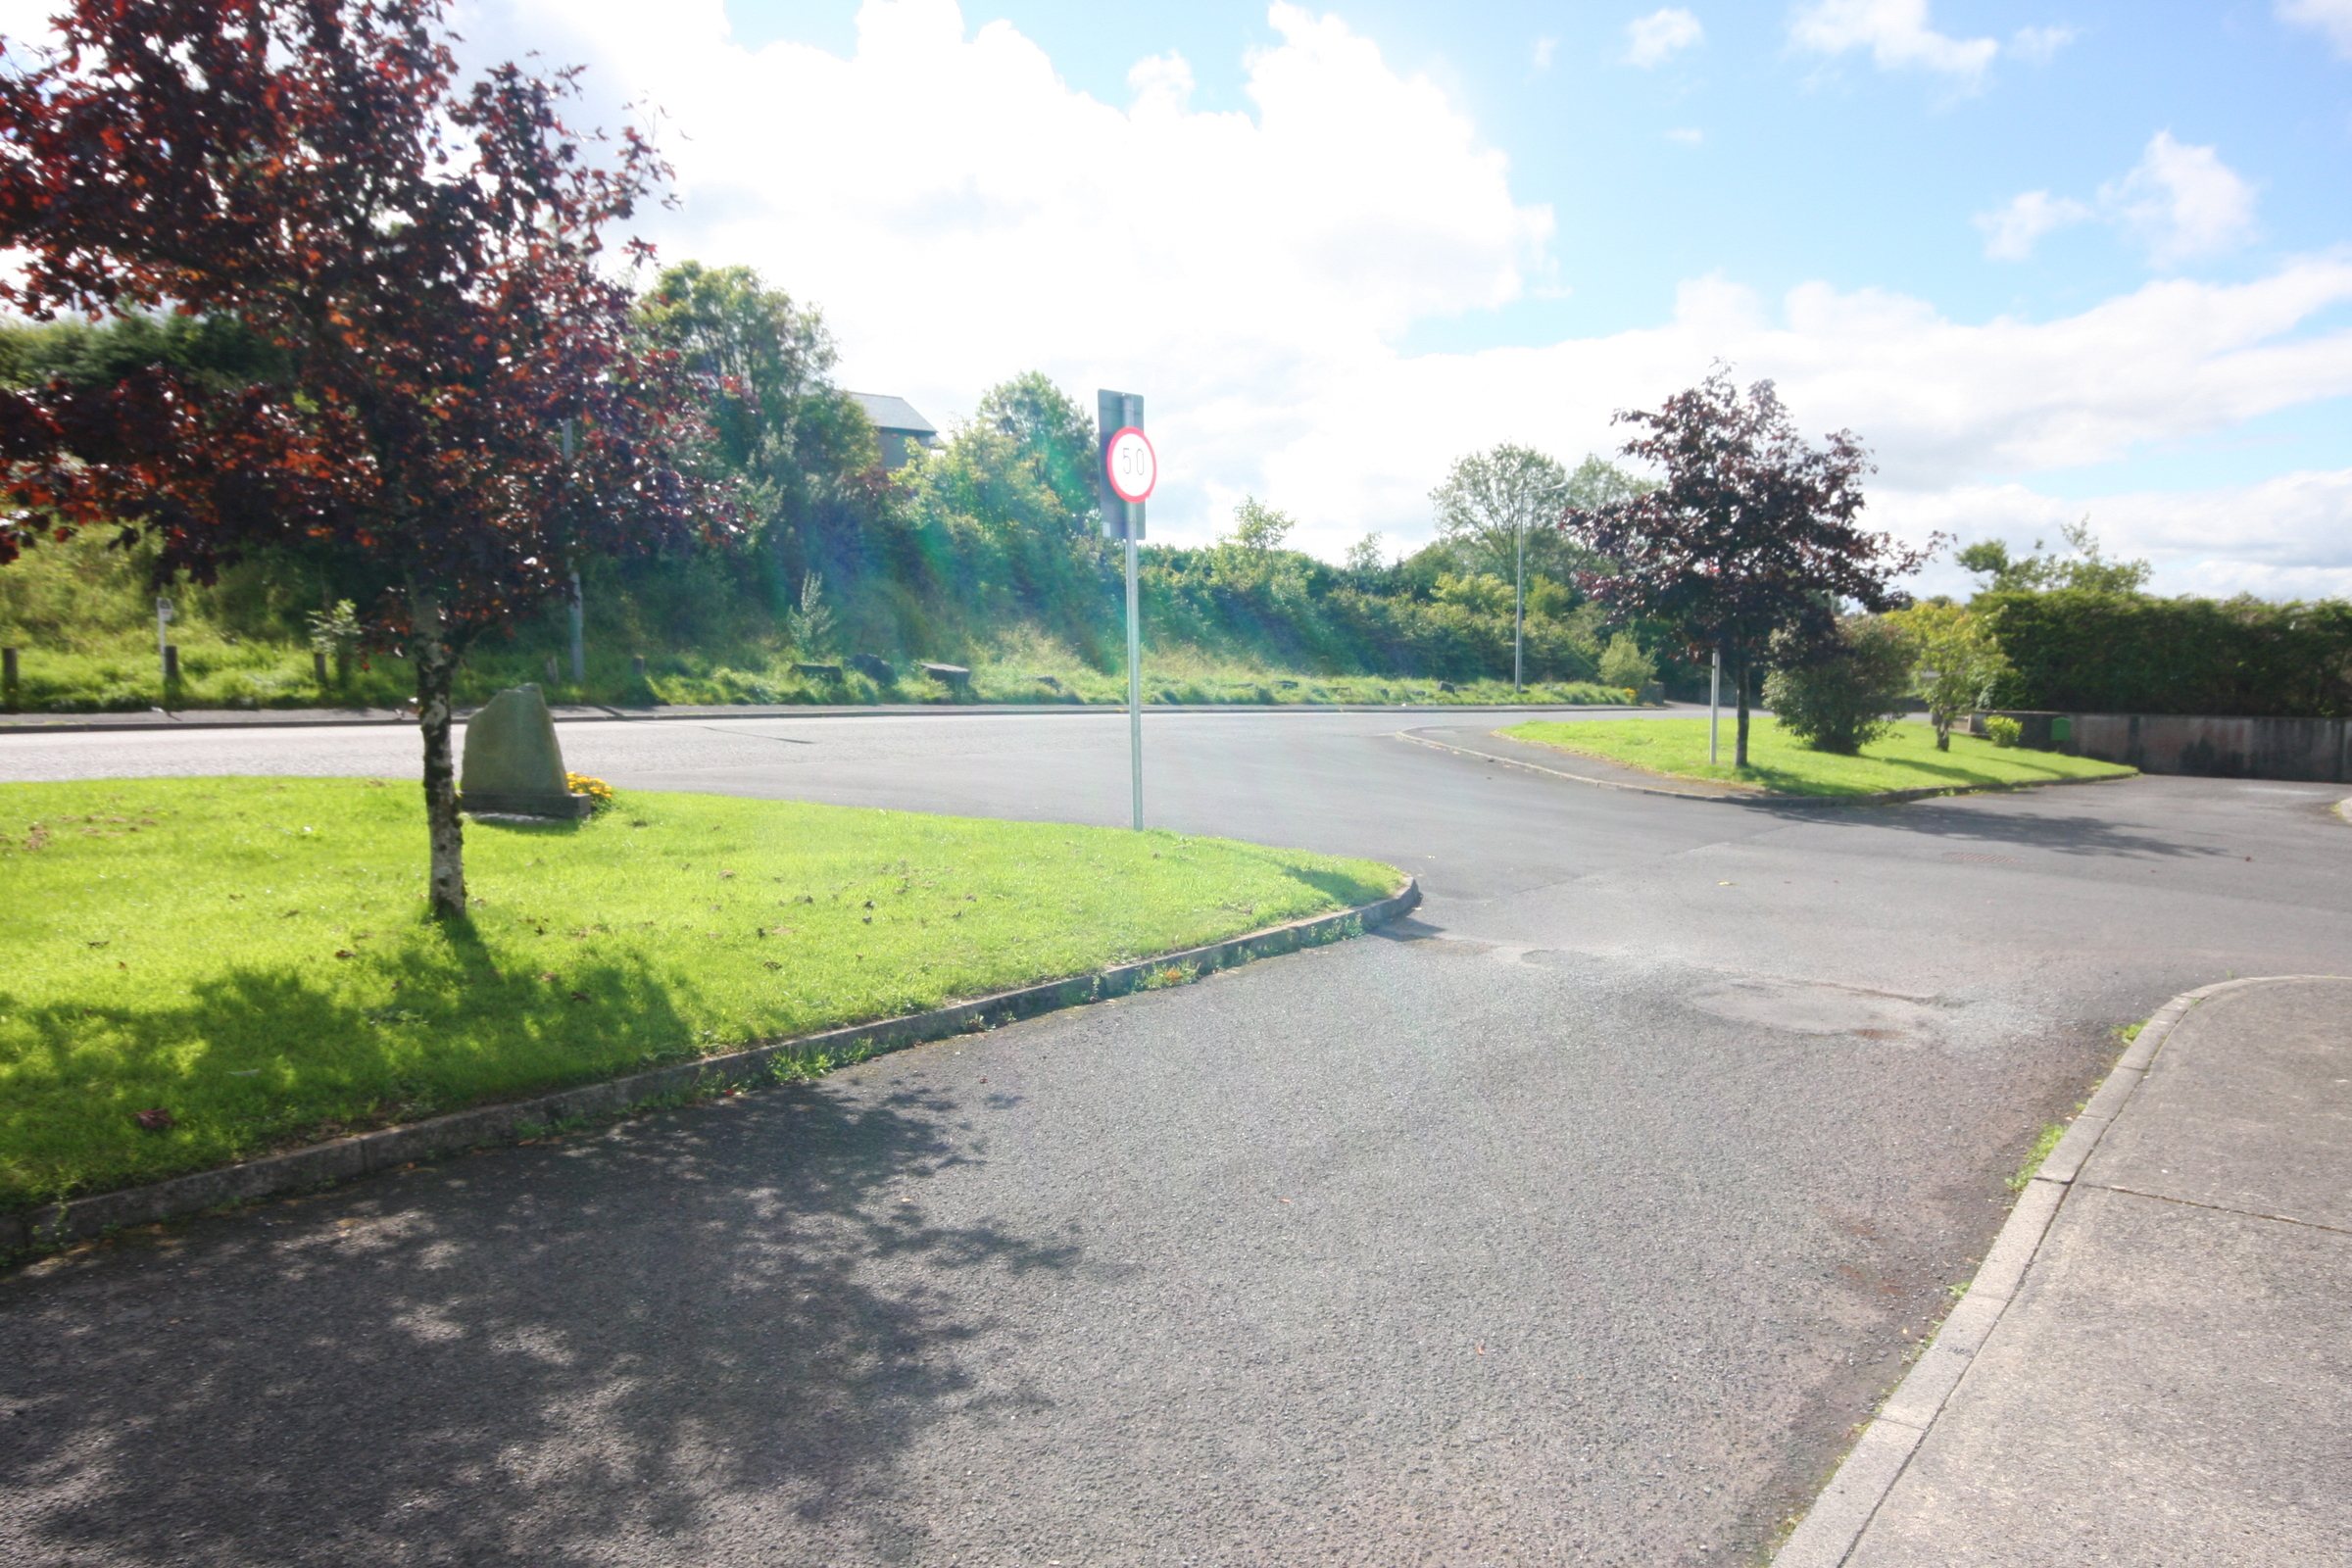 33 Castlehill Park, Turlough Road, Castlebar, Co. Mayo